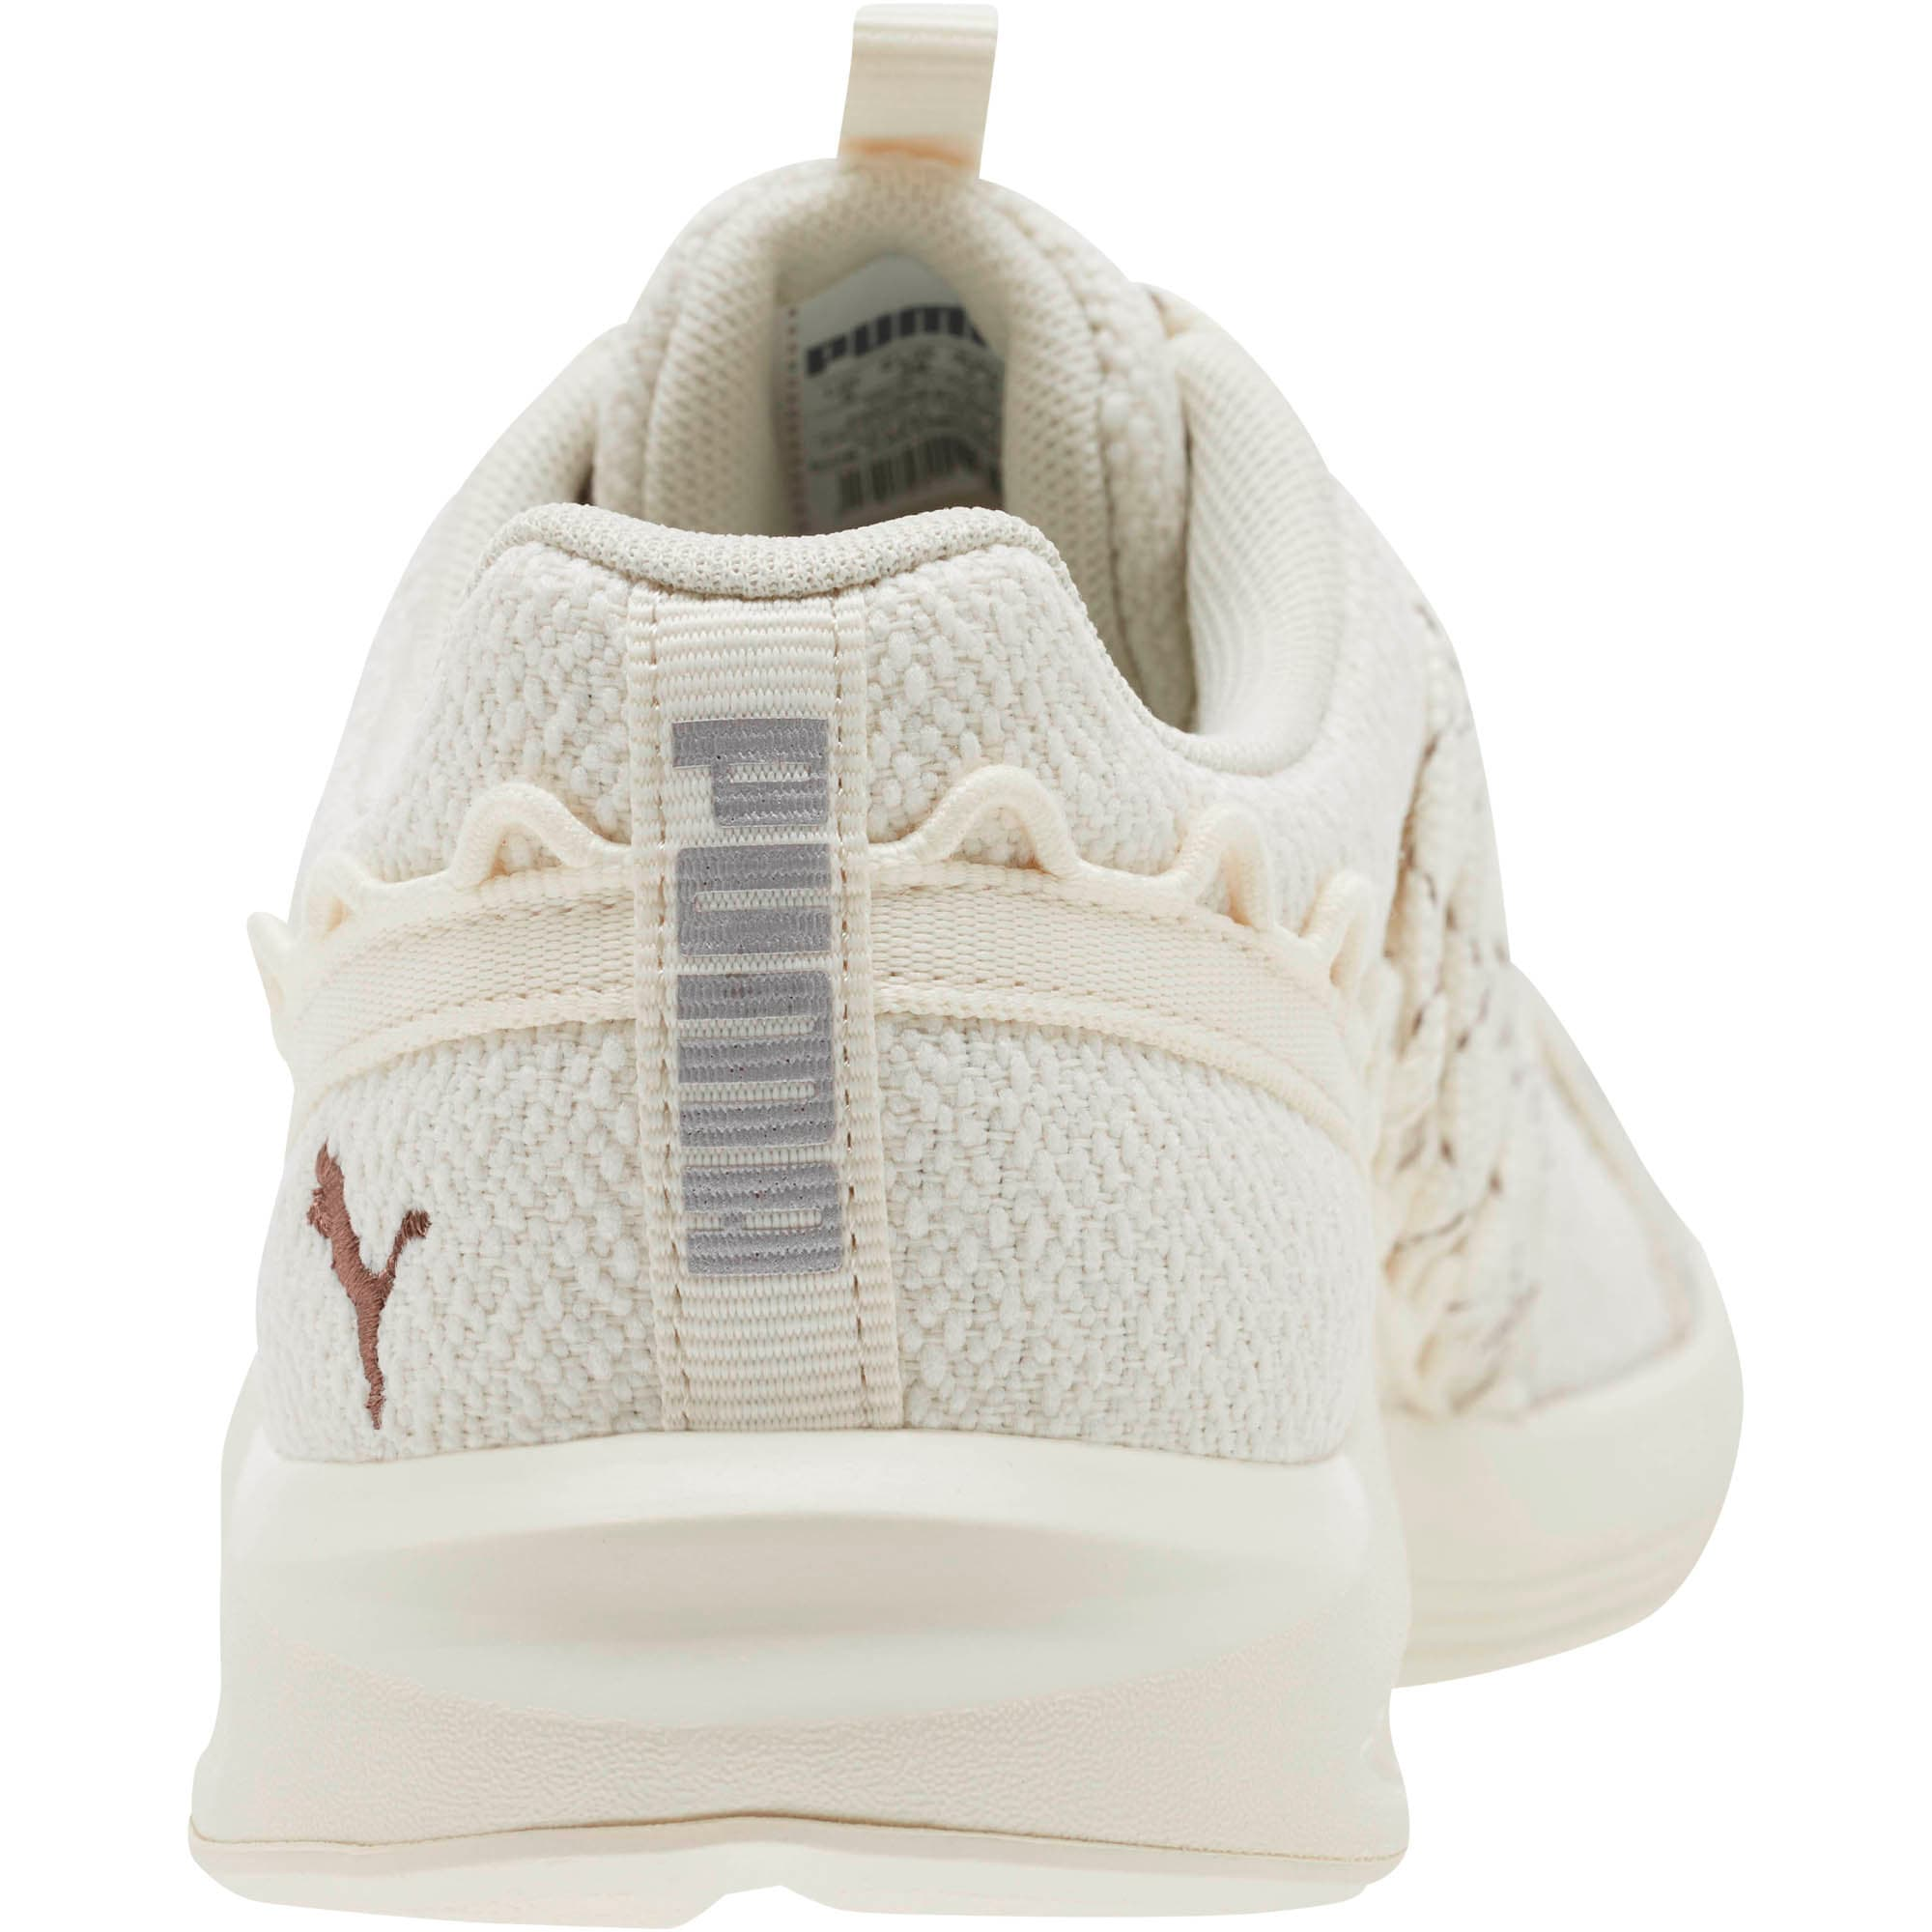 Thumbnail 4 of Prowl Alt 2 LX Women's Training Shoes, Whisper White, medium